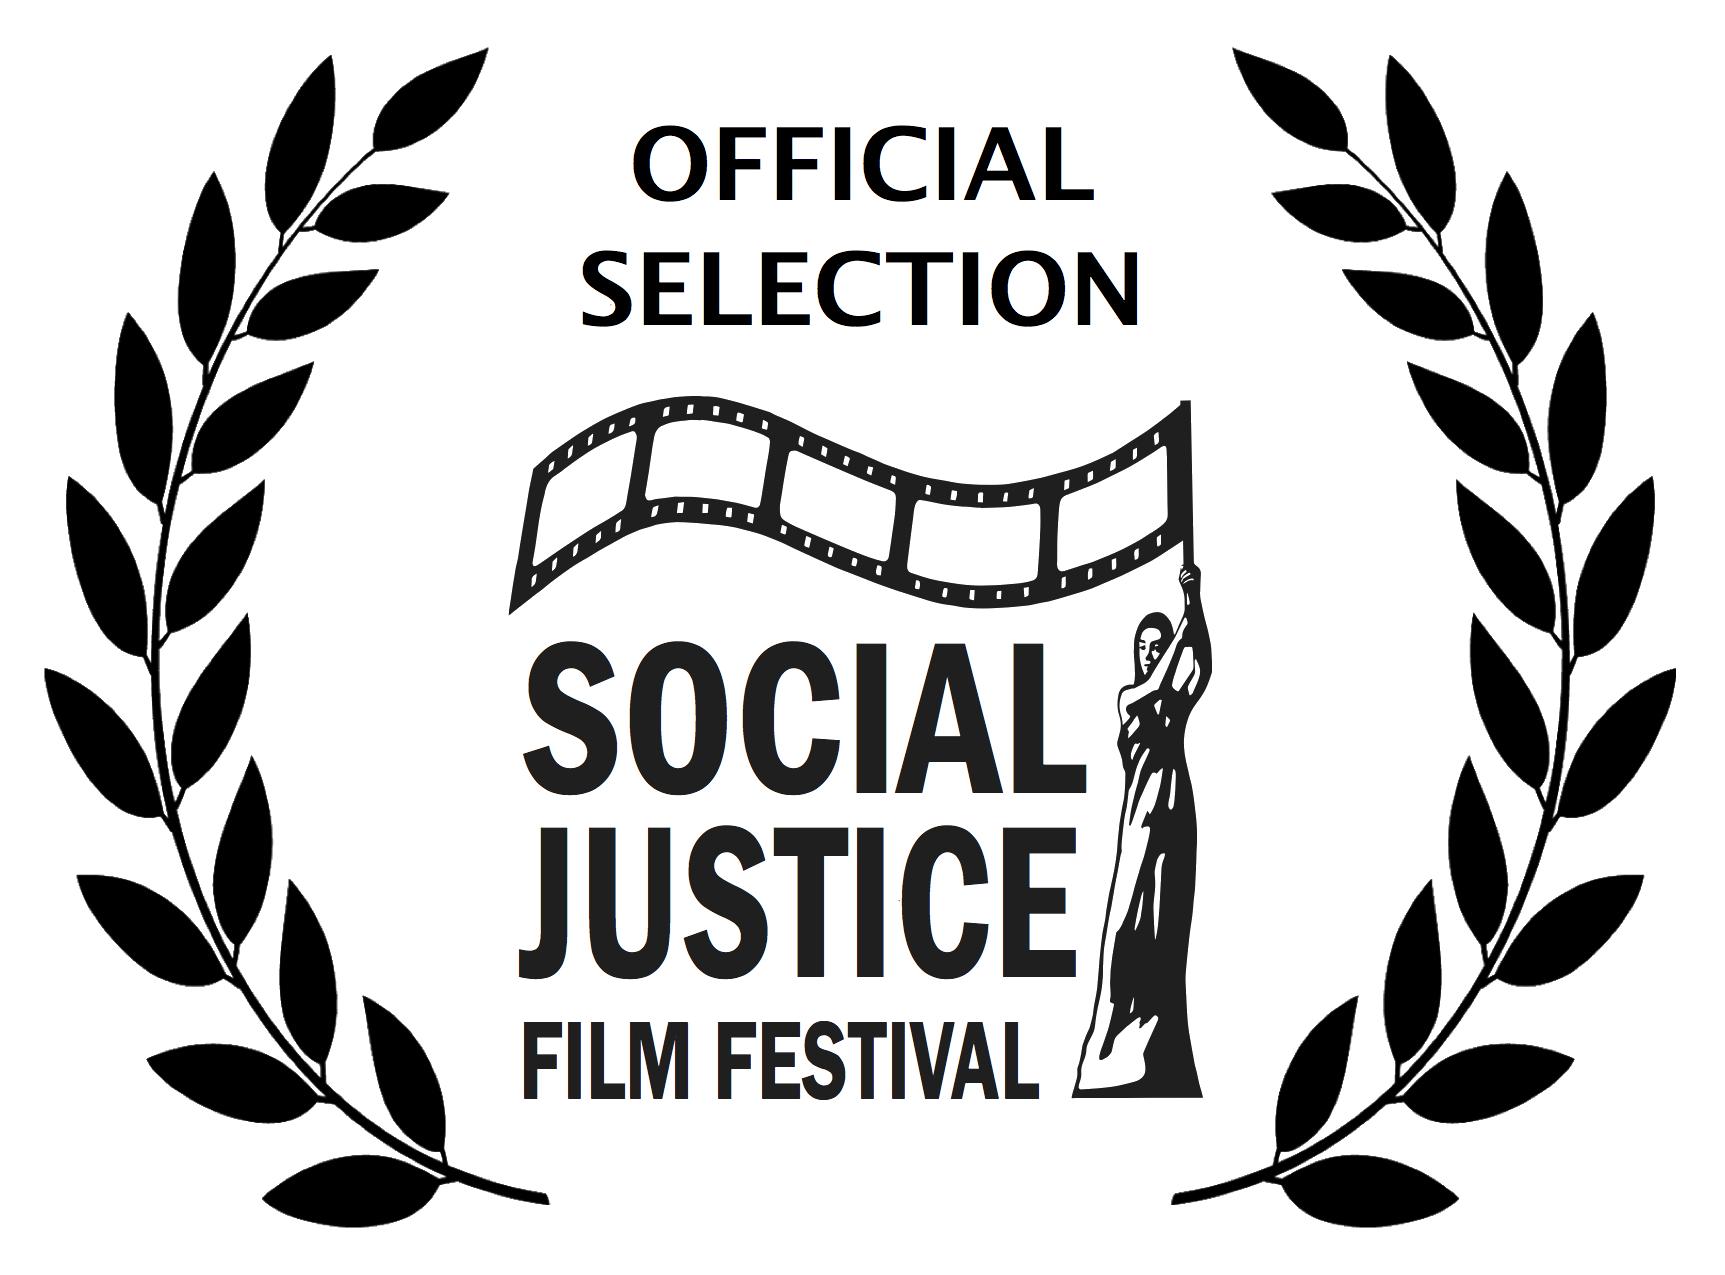 Social Justice Film Festival Laurel Black.png